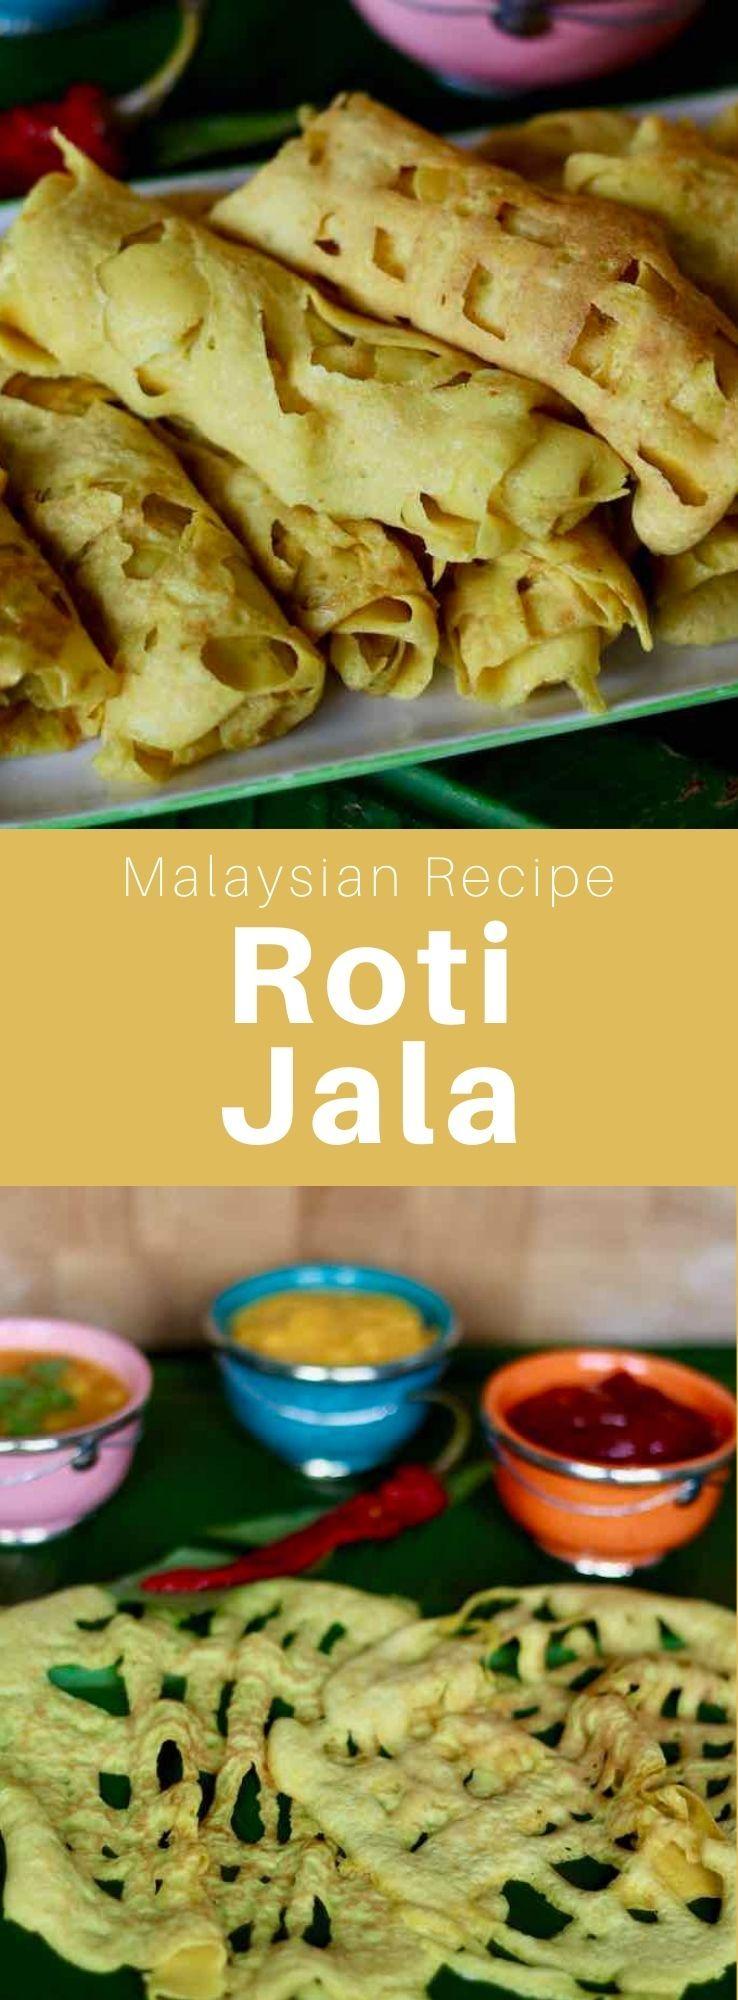 Roti Jala Roti Kirai Or Roti Renjis Is A Type Of Malaysian Lacy Crepe That Is Also Popular In Indonesia And Si Malaysian Food Malaysian Cuisine Global Cuisine